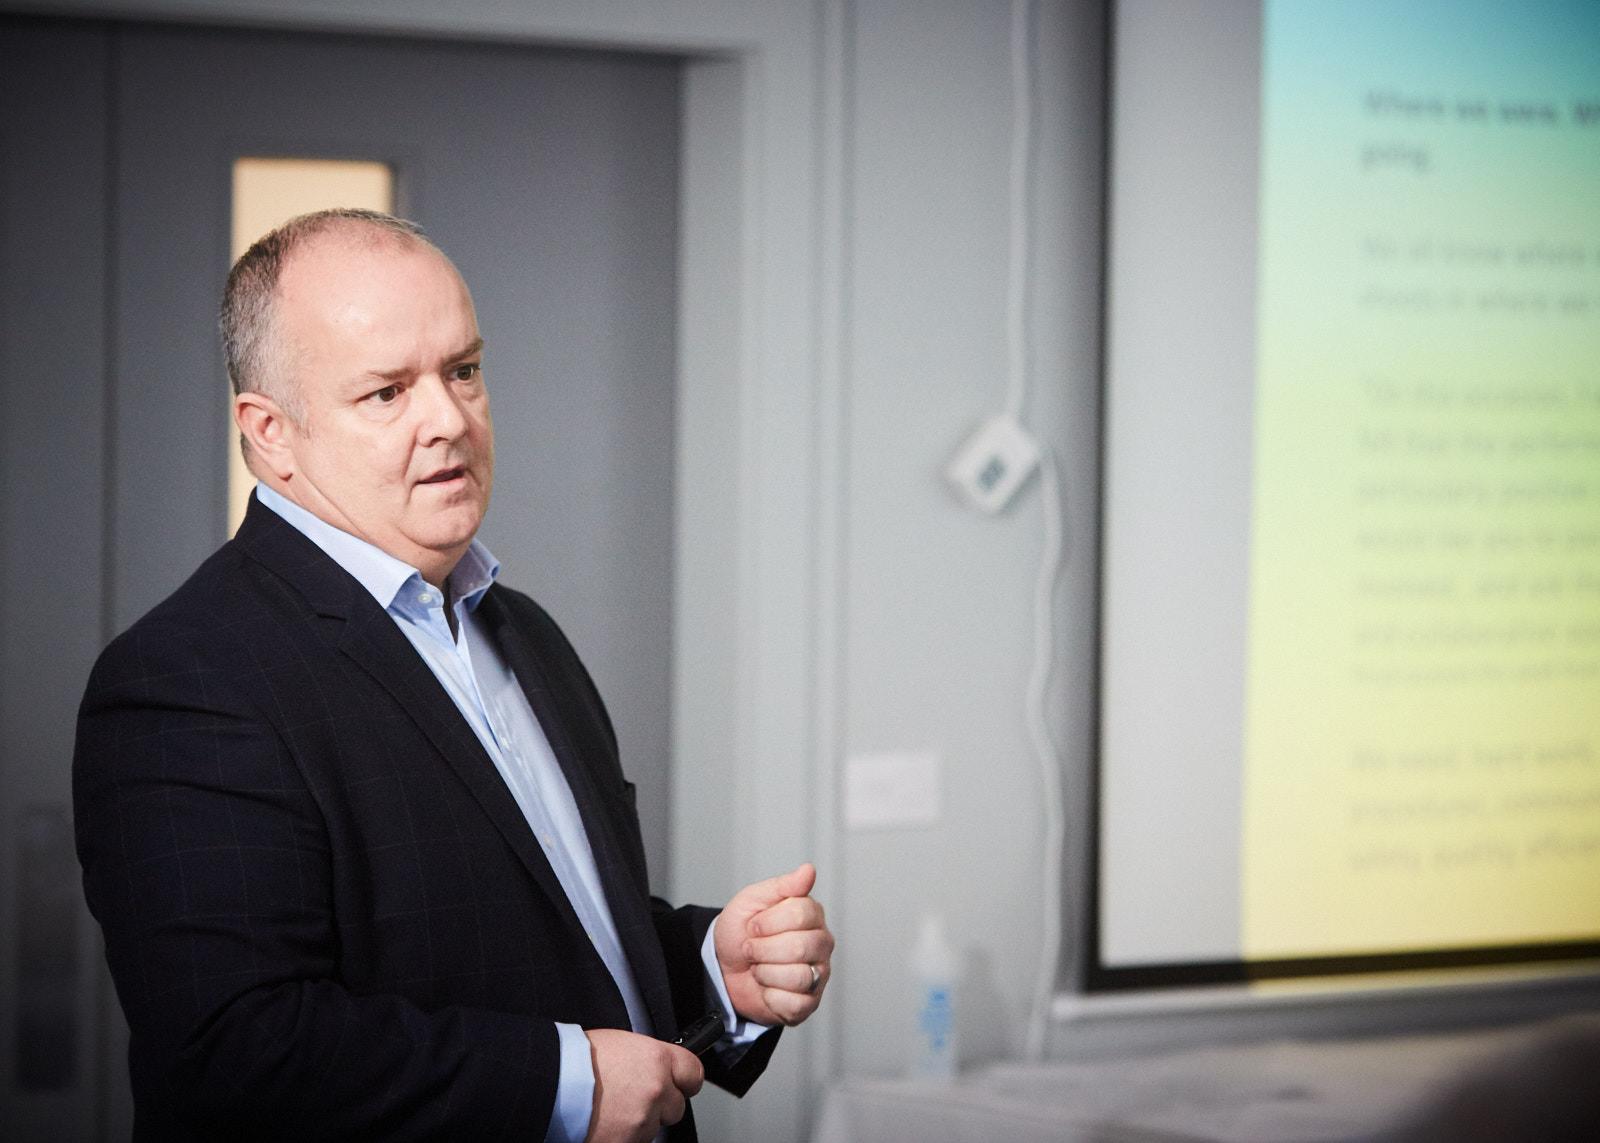 Steve Neilson Worksmart Contracts Refurbishment Scotland